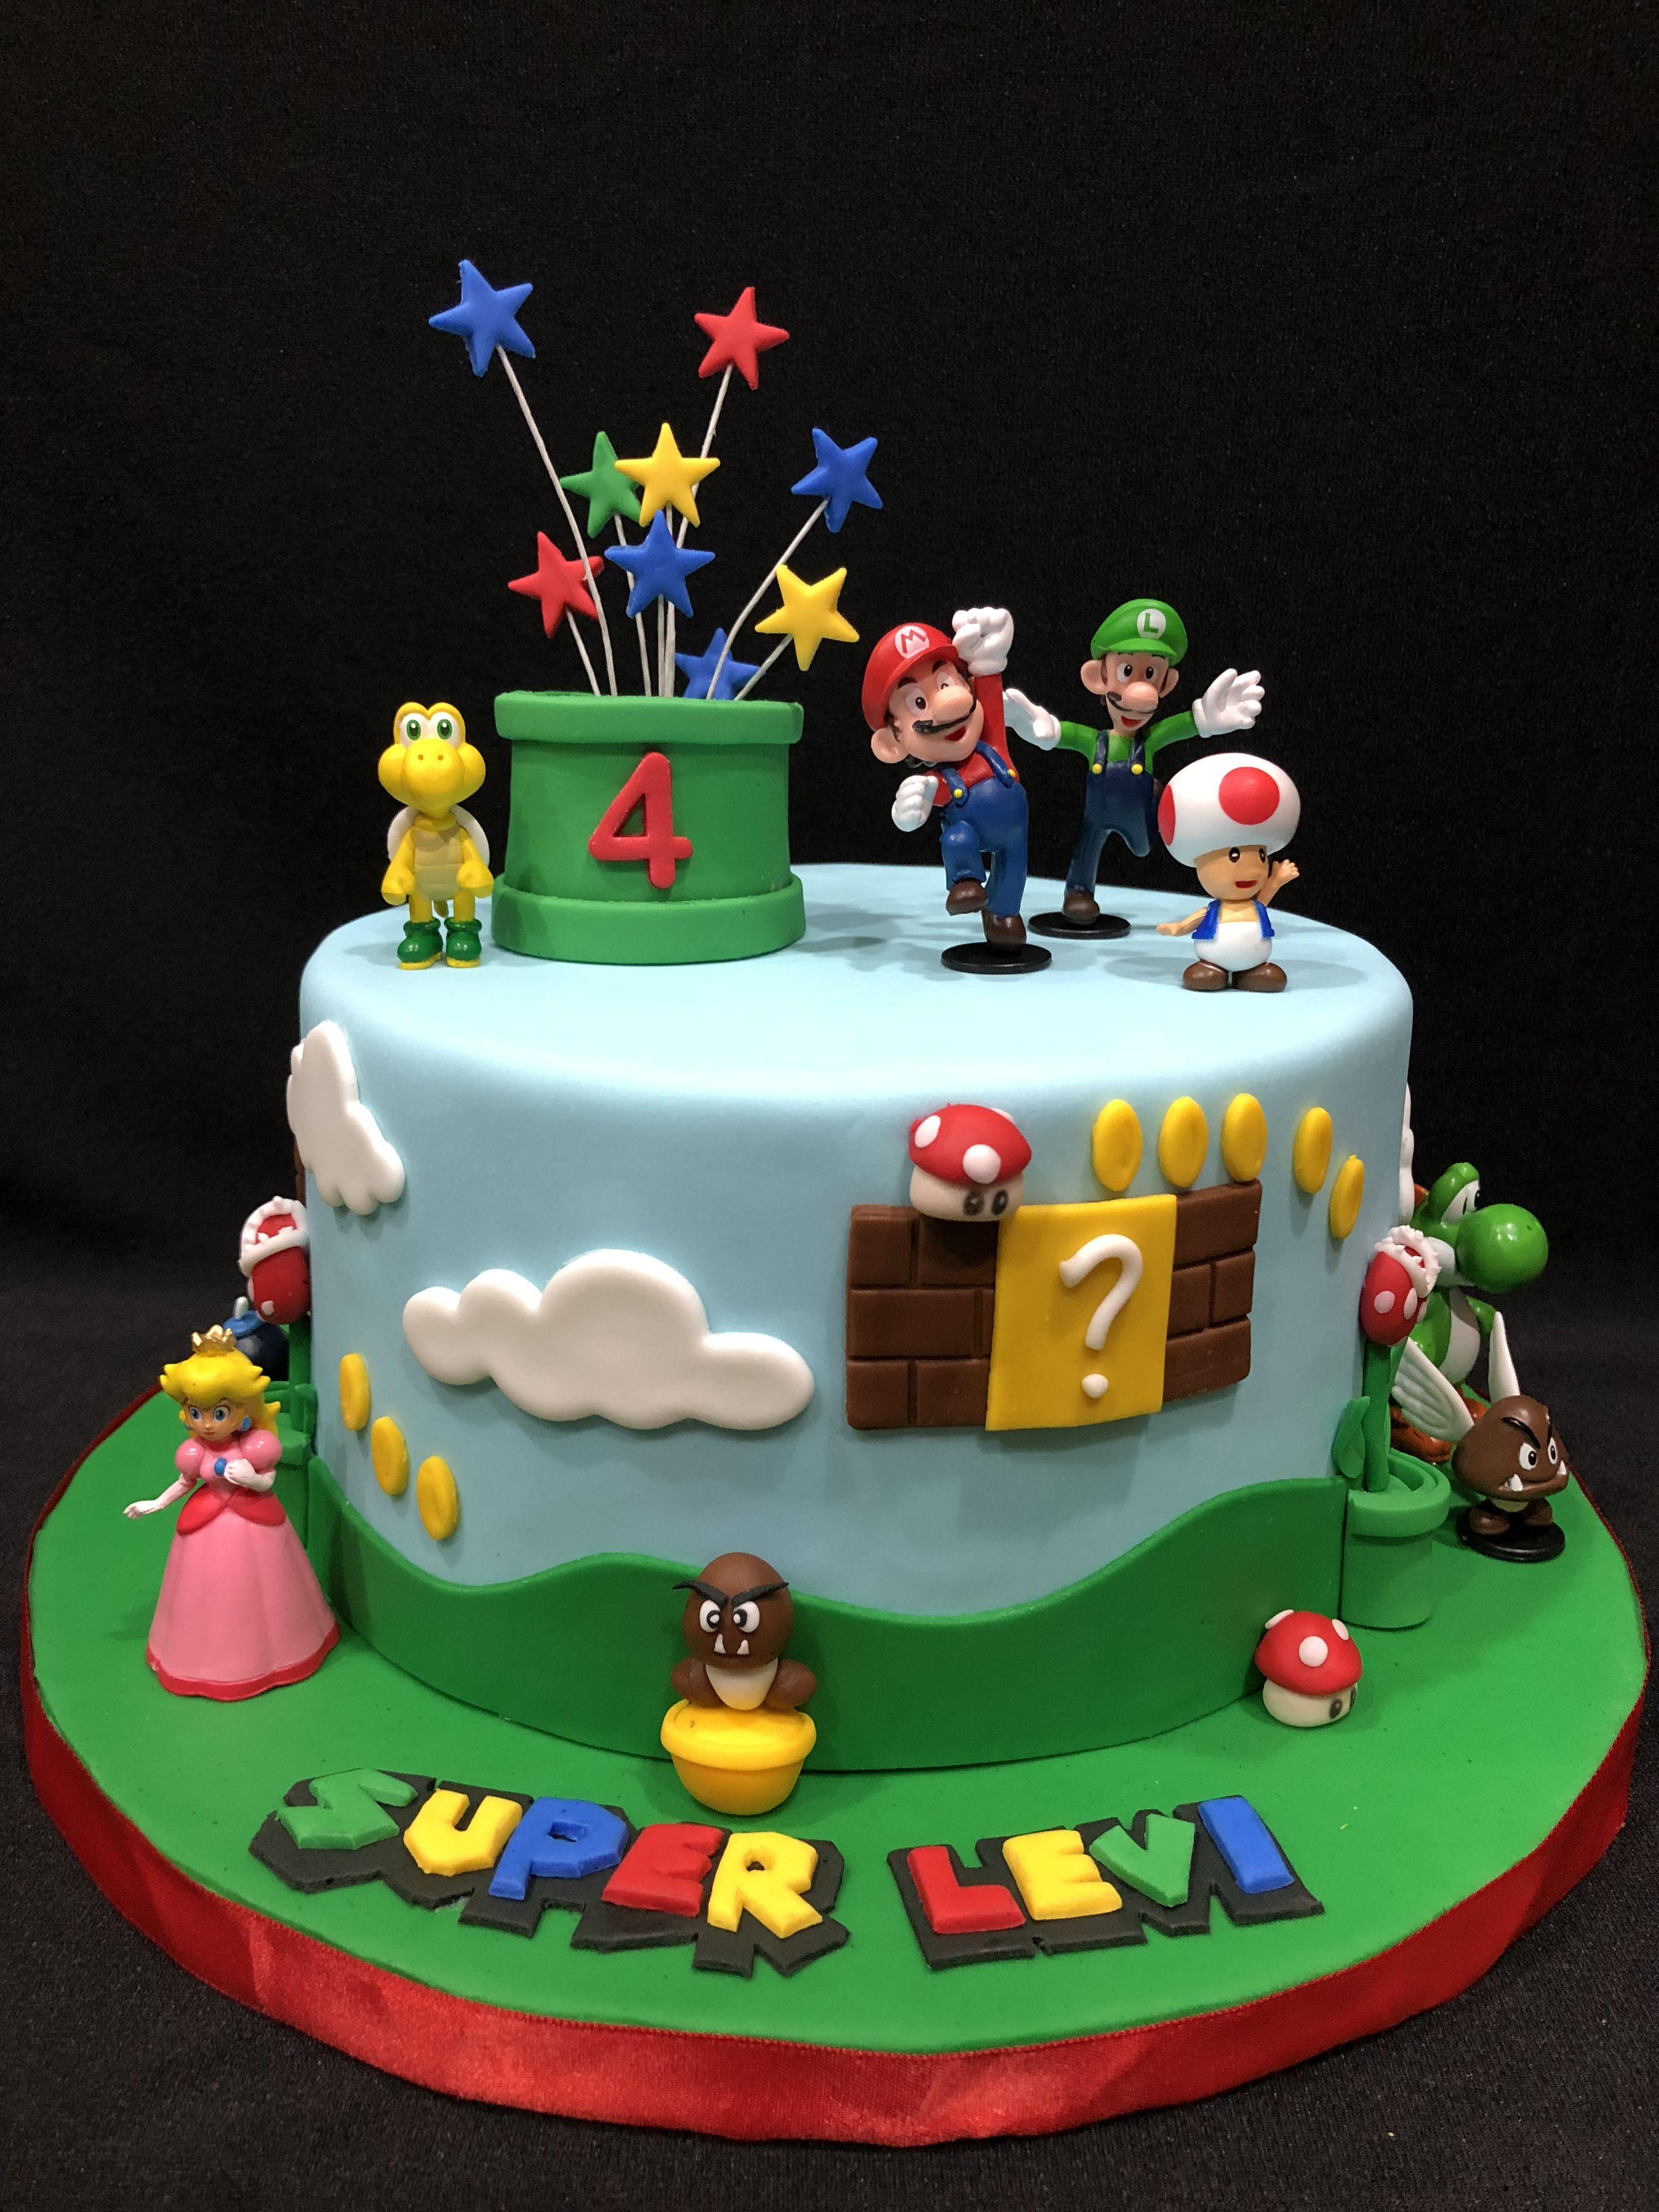 Super Mario Brothers Birthday Cake With Images Mario Birthday